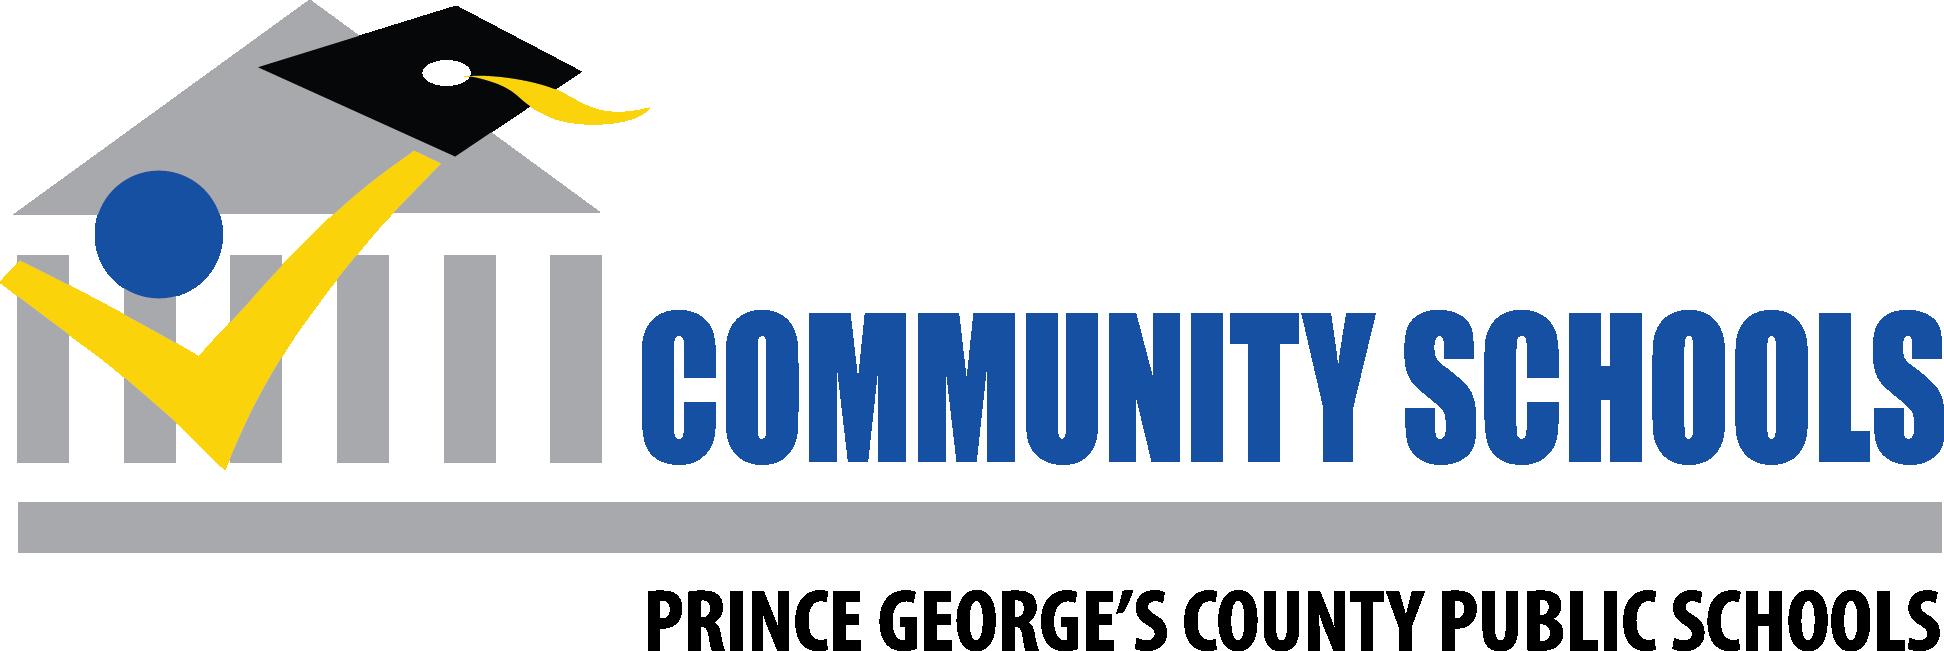 Community Schools Logo 1